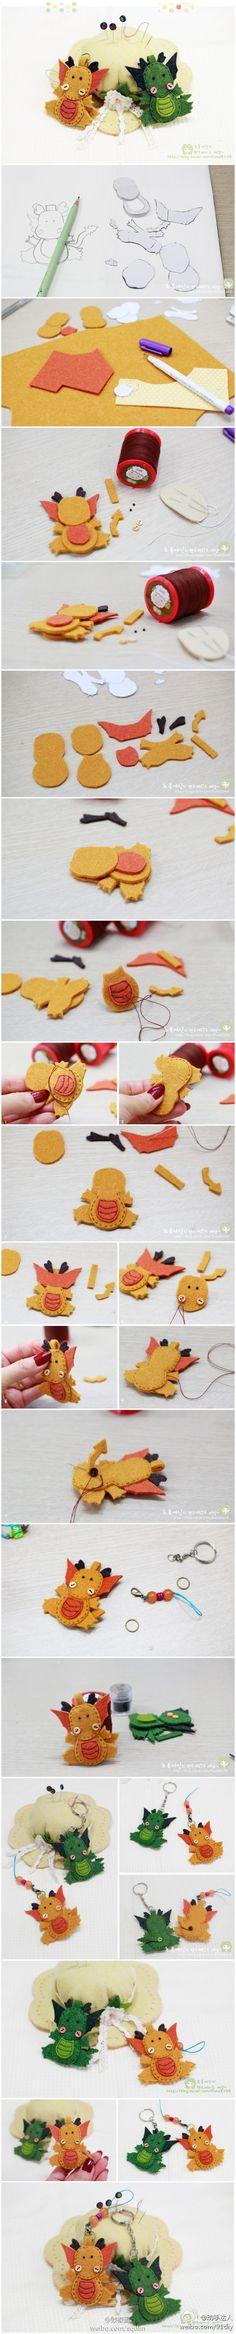 dragon---- so cute dragon